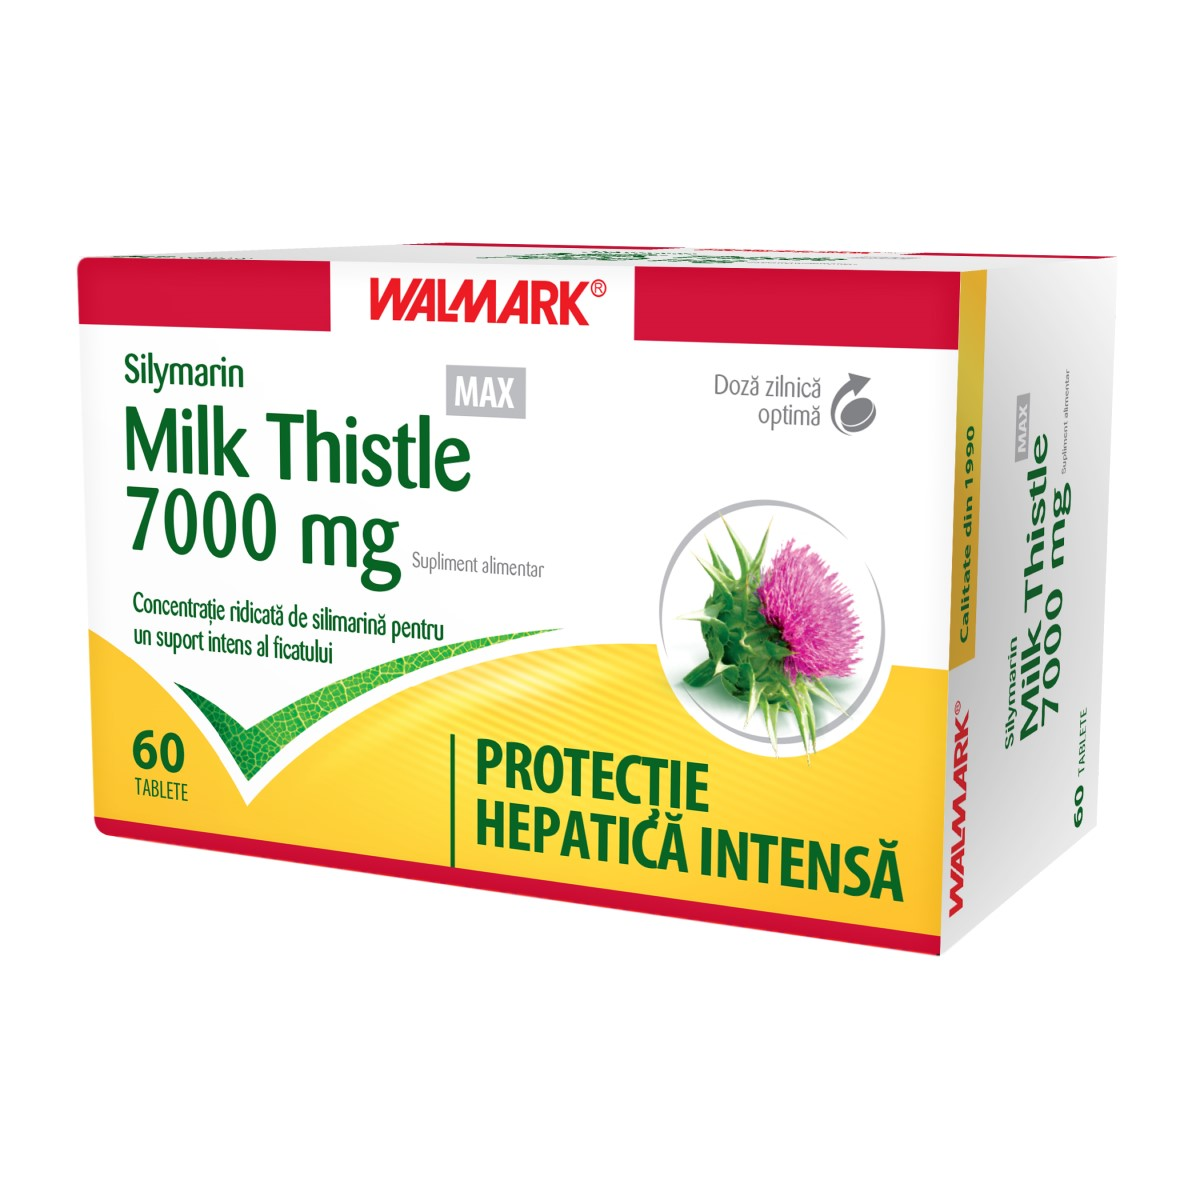 Silymarin Milk Thistle MAX, 60 comprimate filmate, Walmark imagine produs 2021